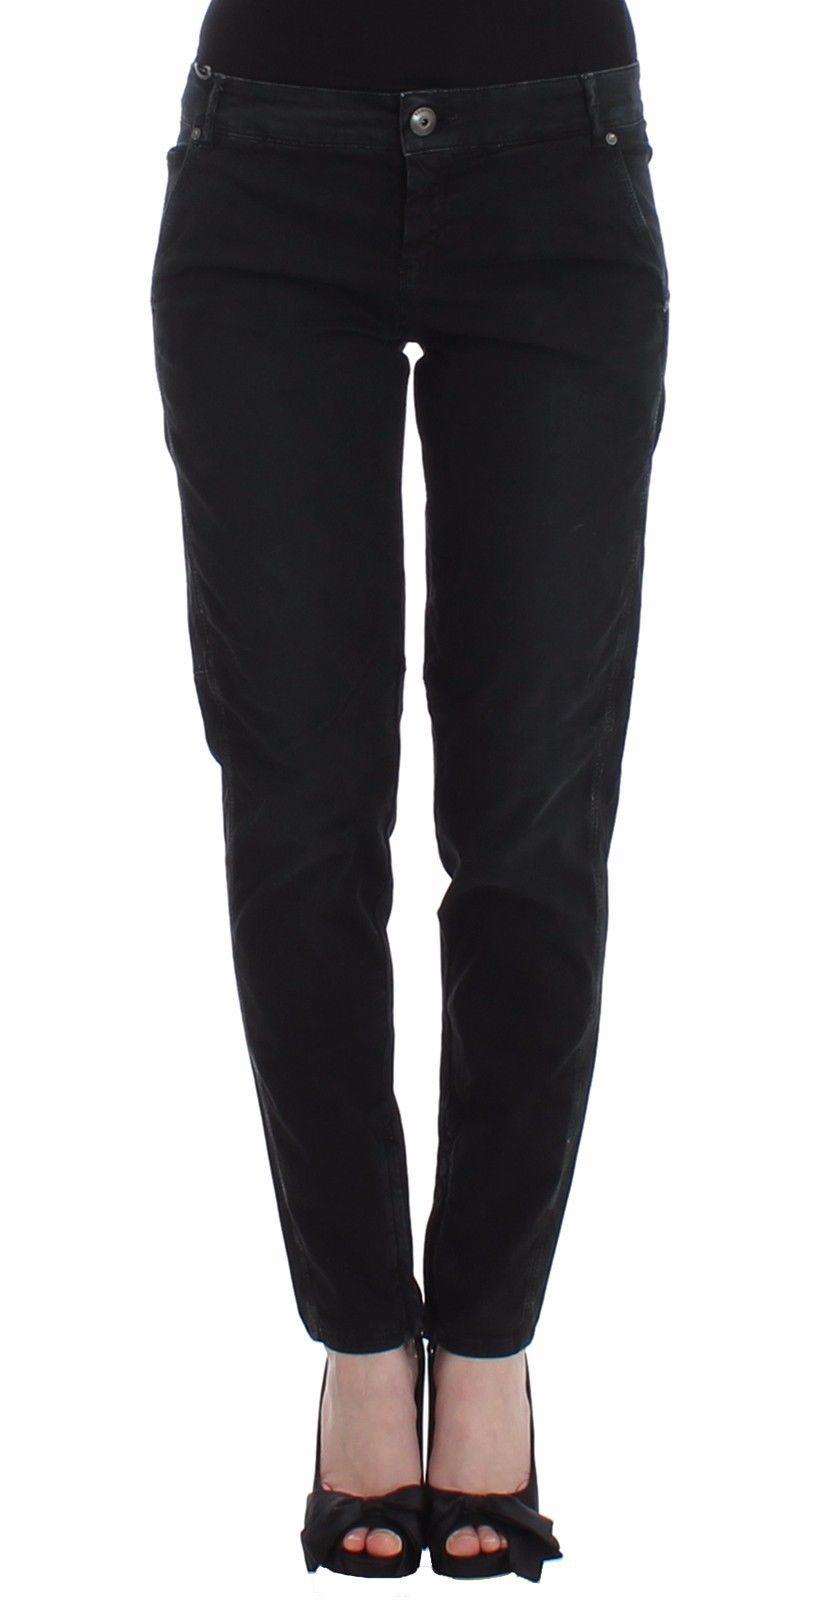 Ermanno Scervino Women's Skinny Leg Jeans Black SIG12461 - W34